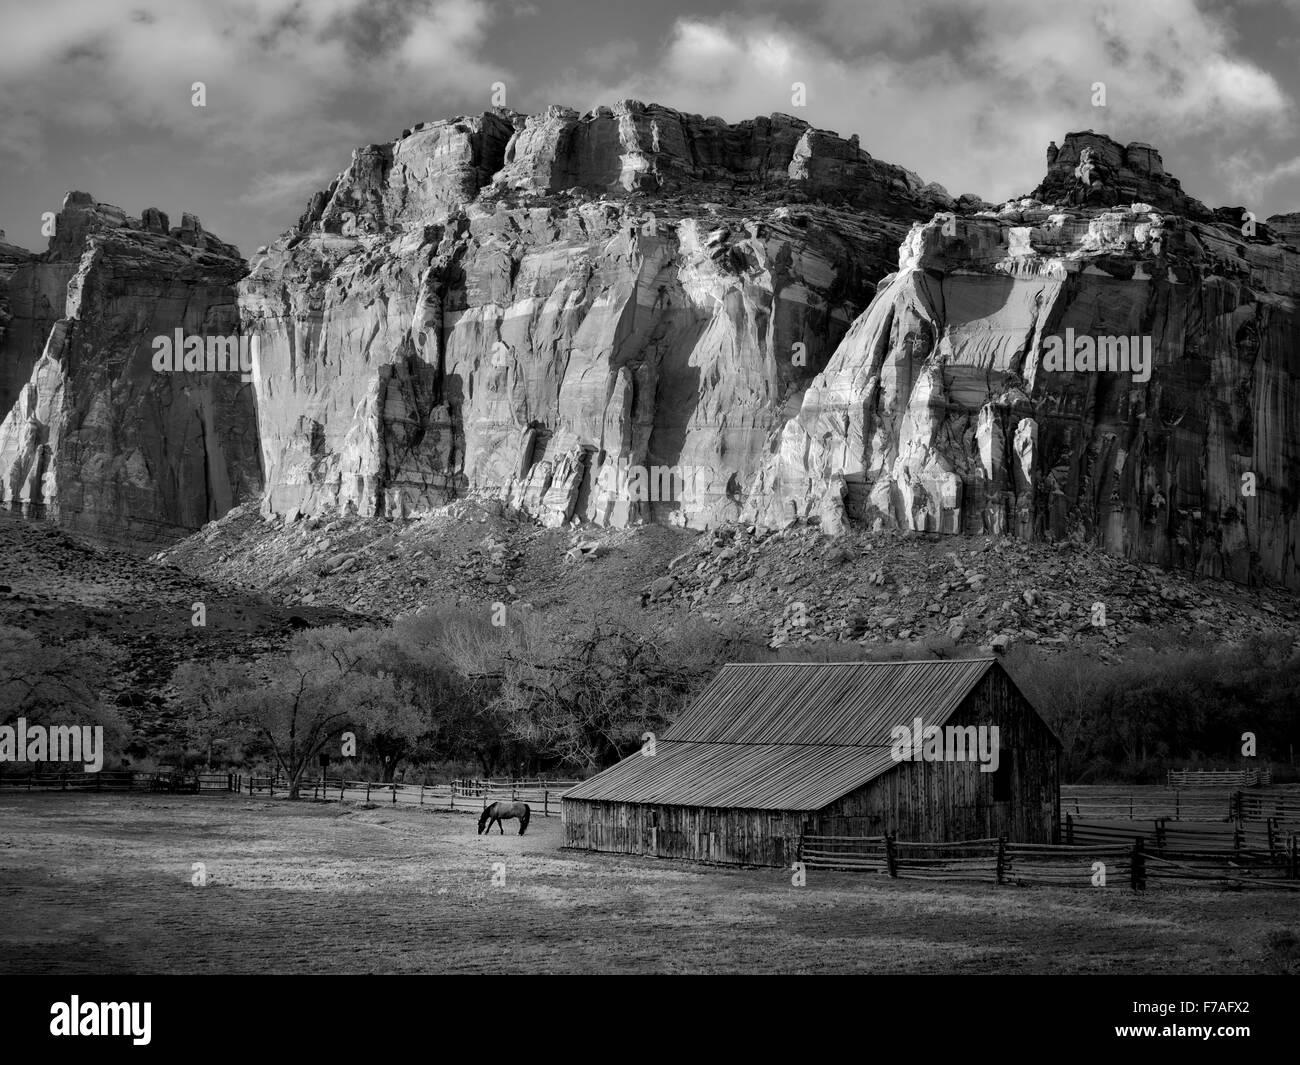 Gifford farm barn and horse. Fruita, Capitol Reef National Park, Utah - Stock Image